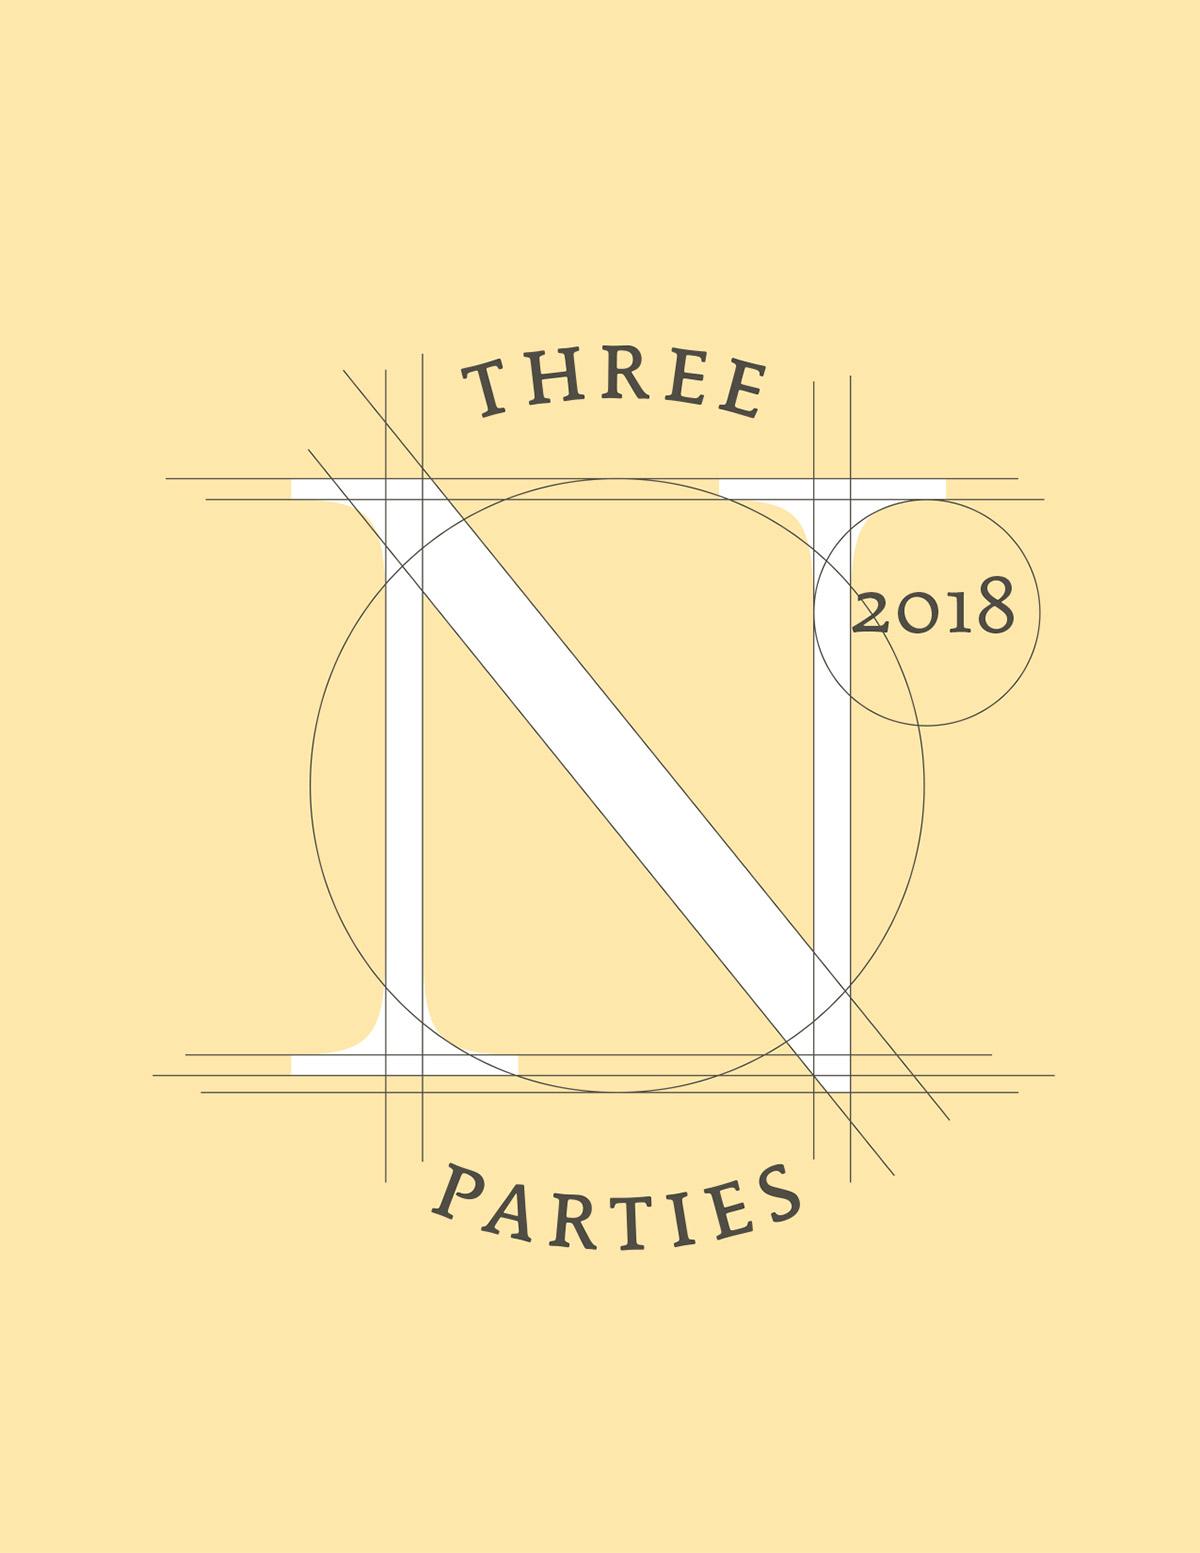 Identity-NF-Three-Parties